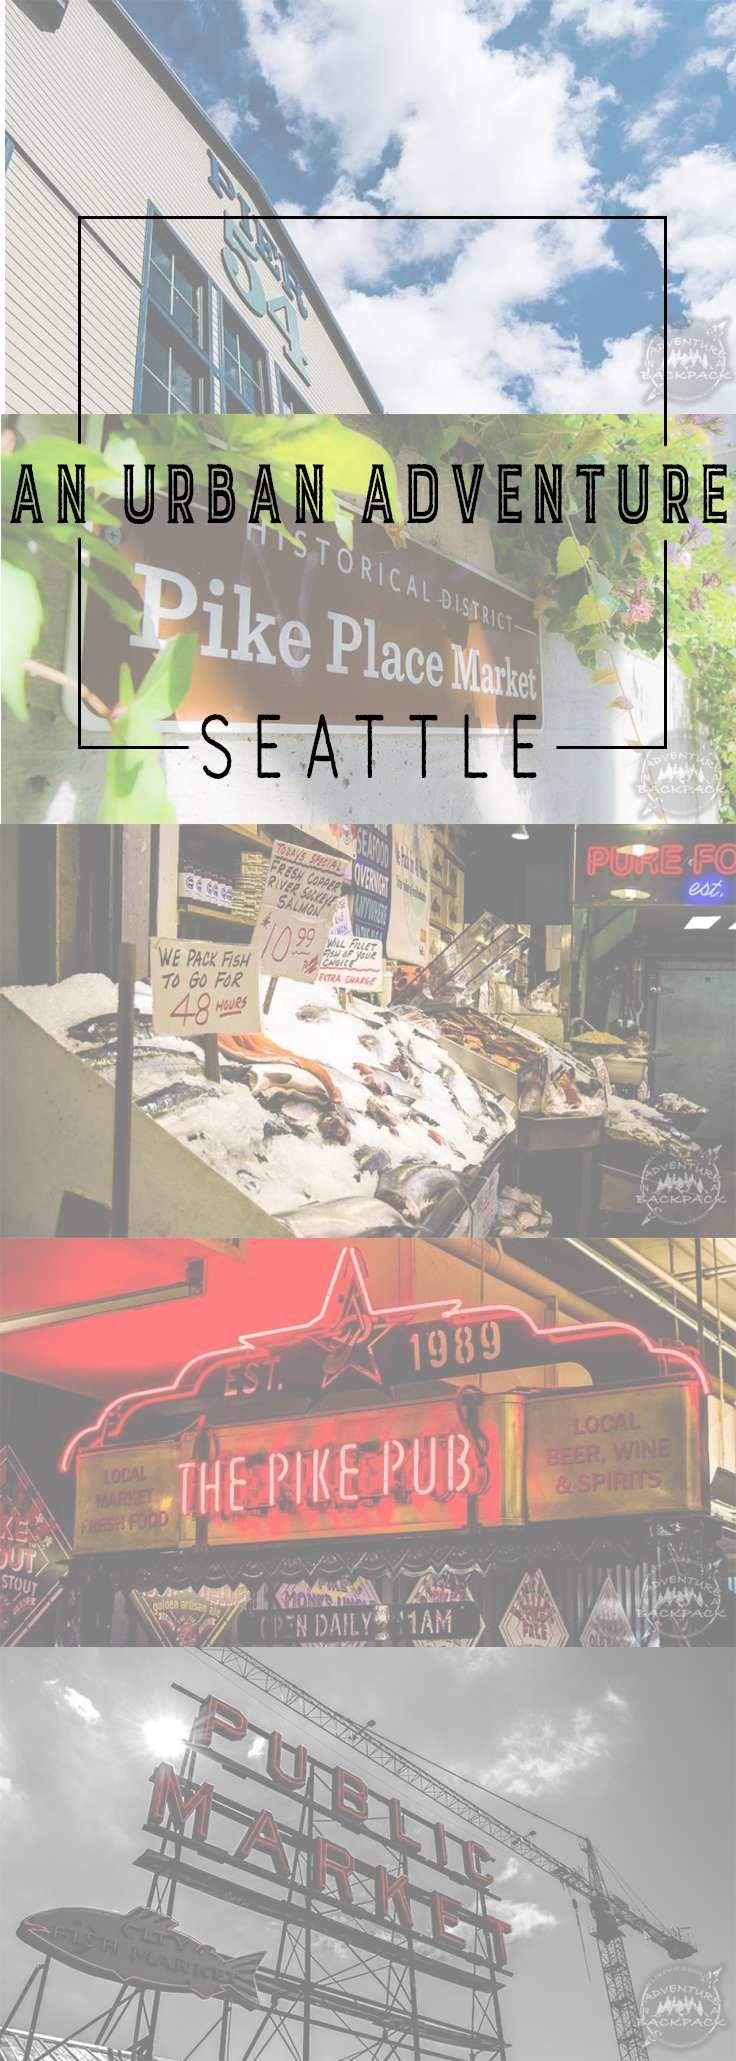 Seattle | Seattle Starbucks | Seattle Food | Seattle Restaurants | Seattle Downtown